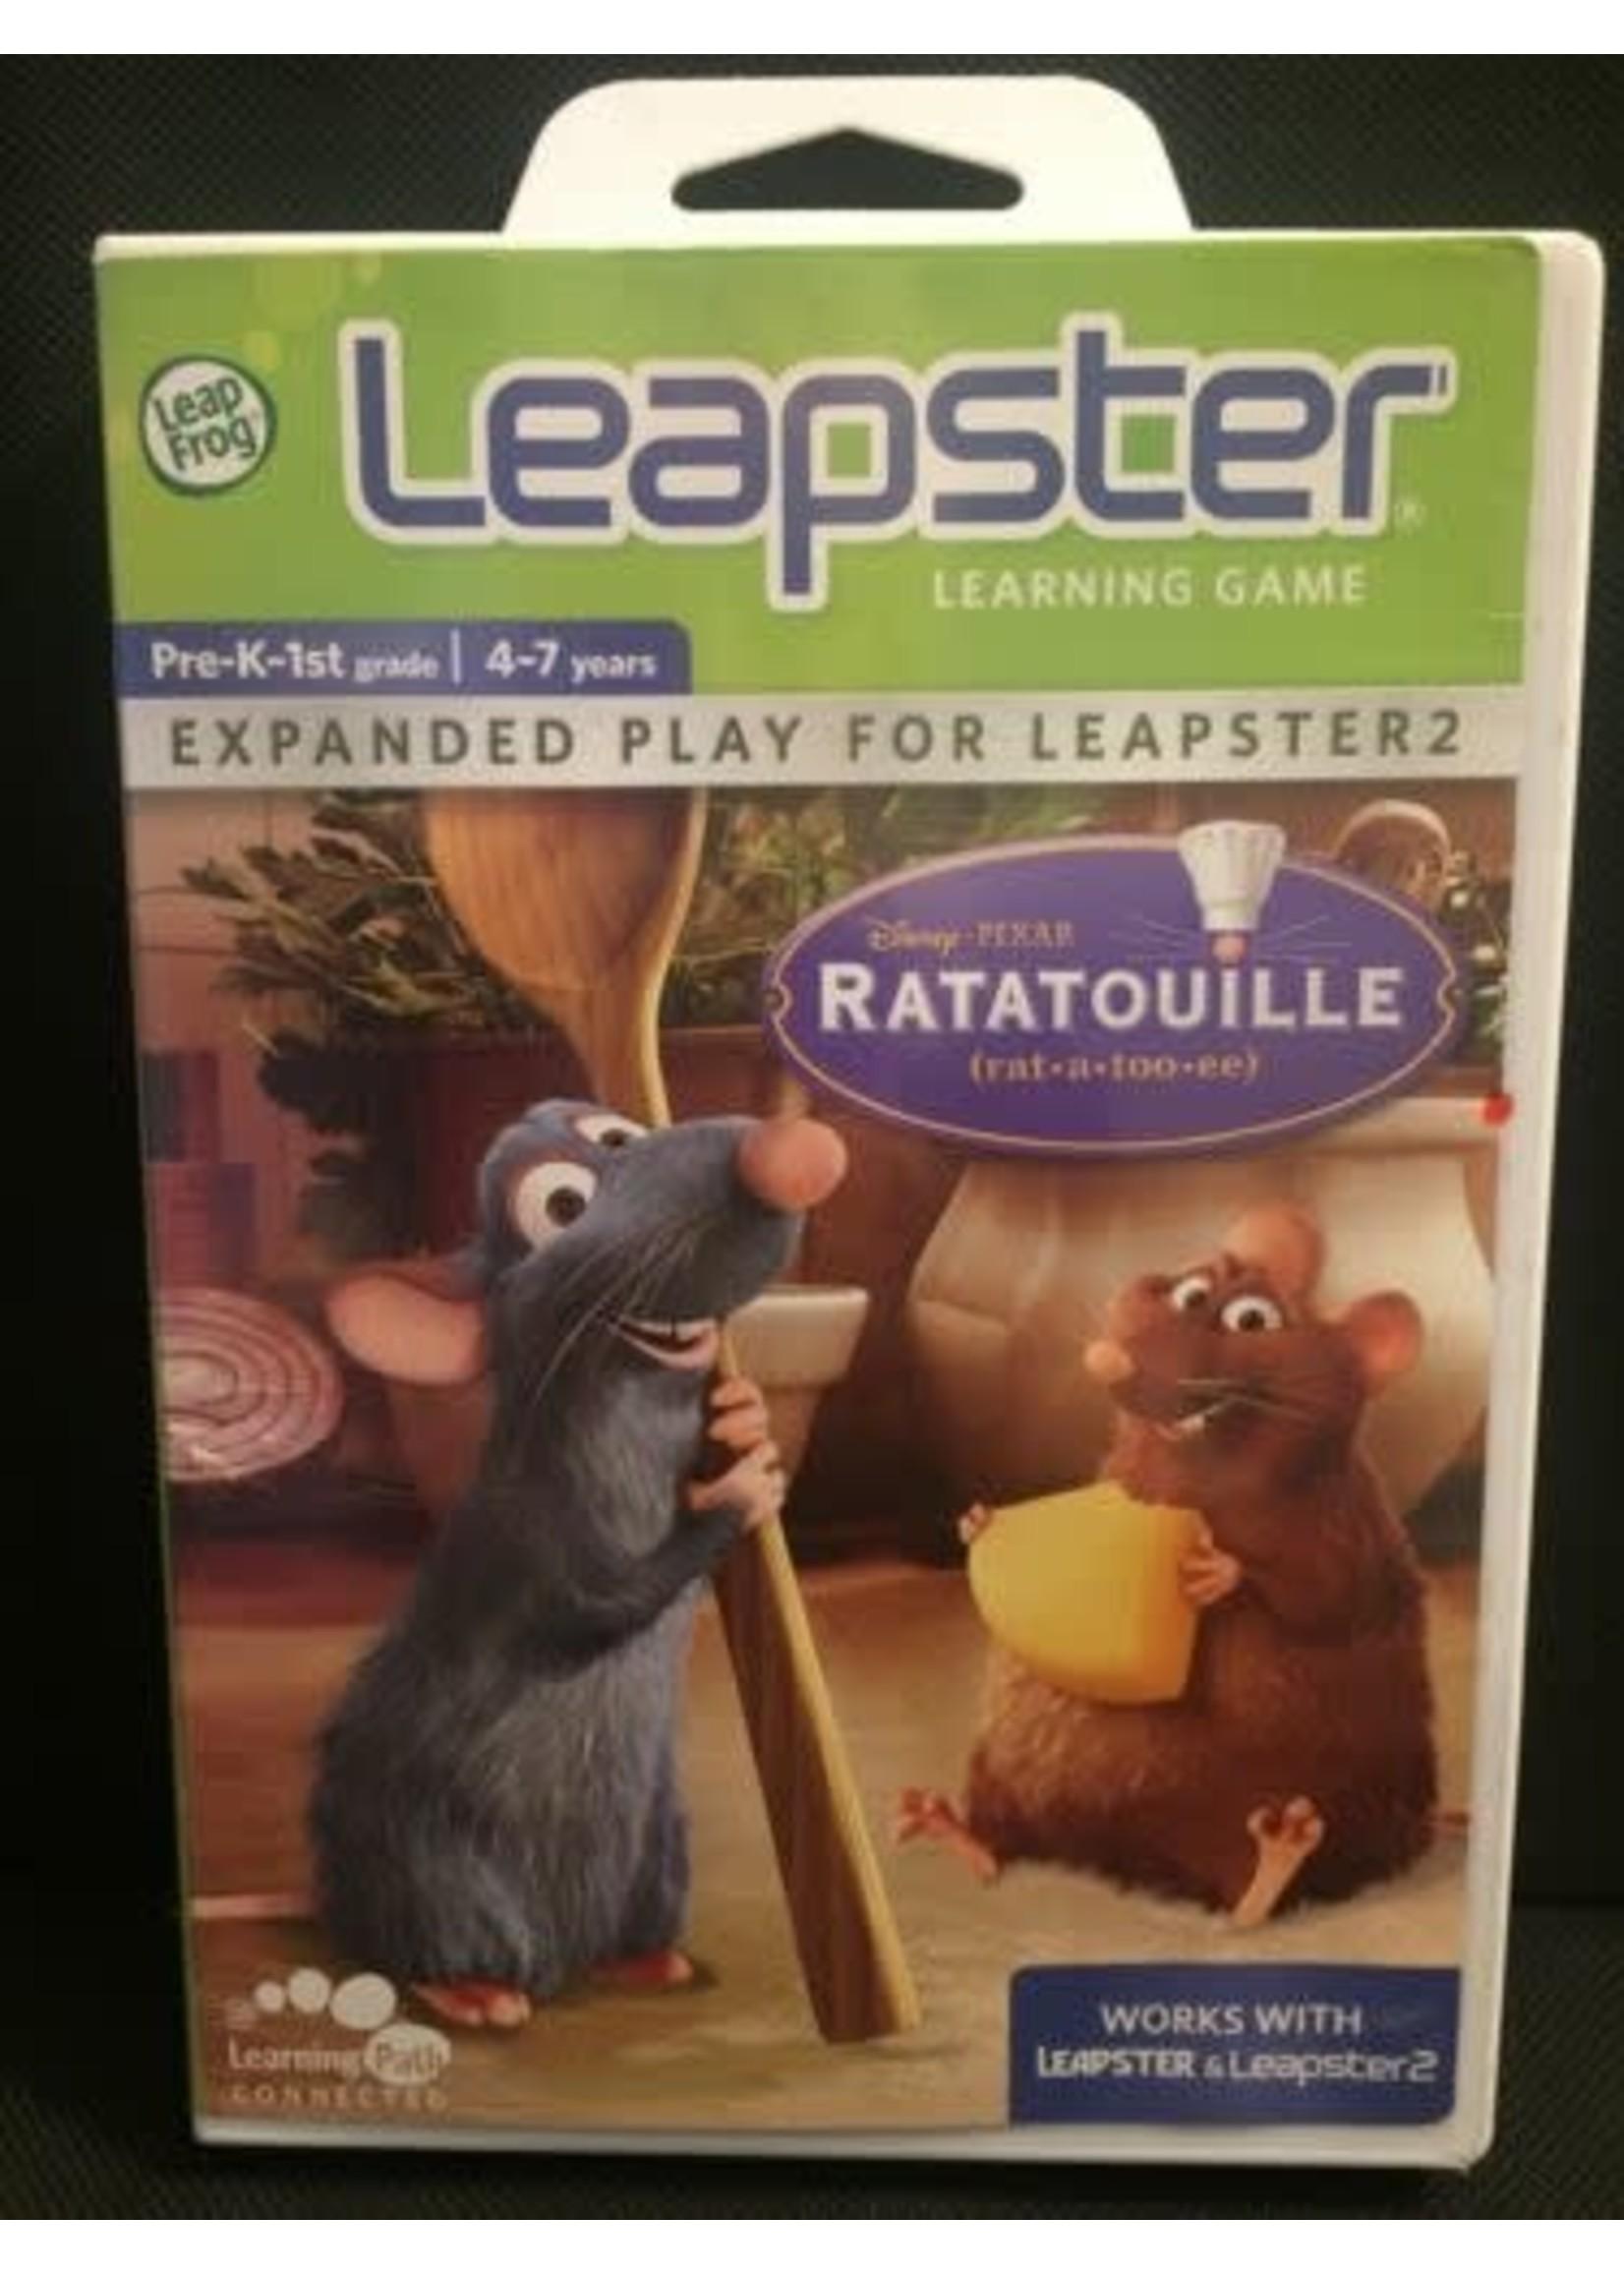 LeapFrog Leapster2 Learning Game Ratatouille